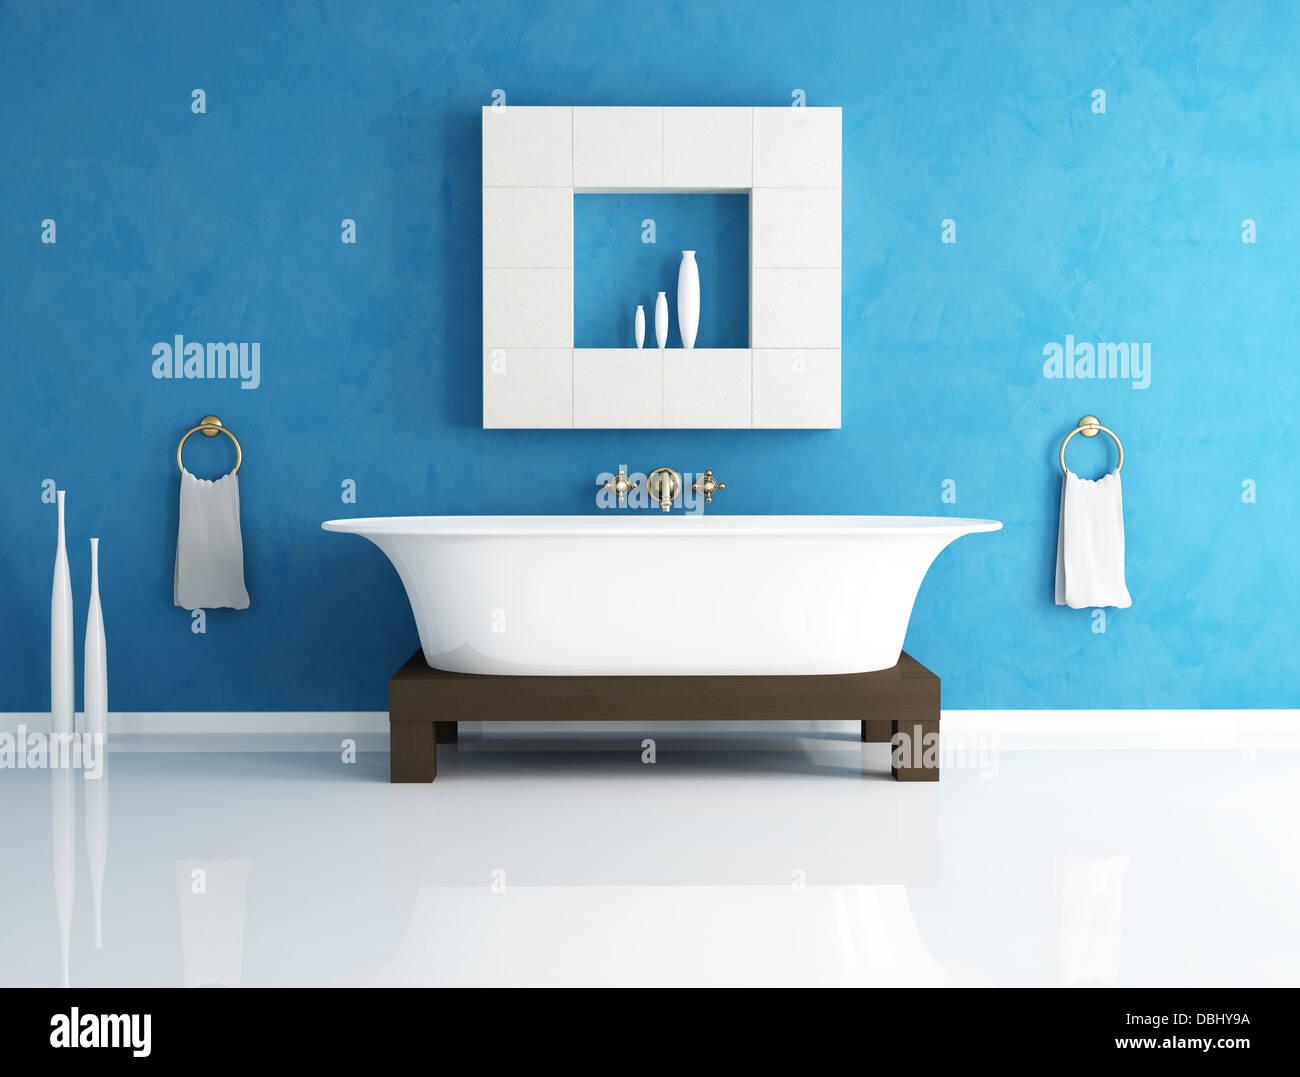 Vintage Bathtub Stock Photos & Vintage Bathtub Stock Images - Alamy